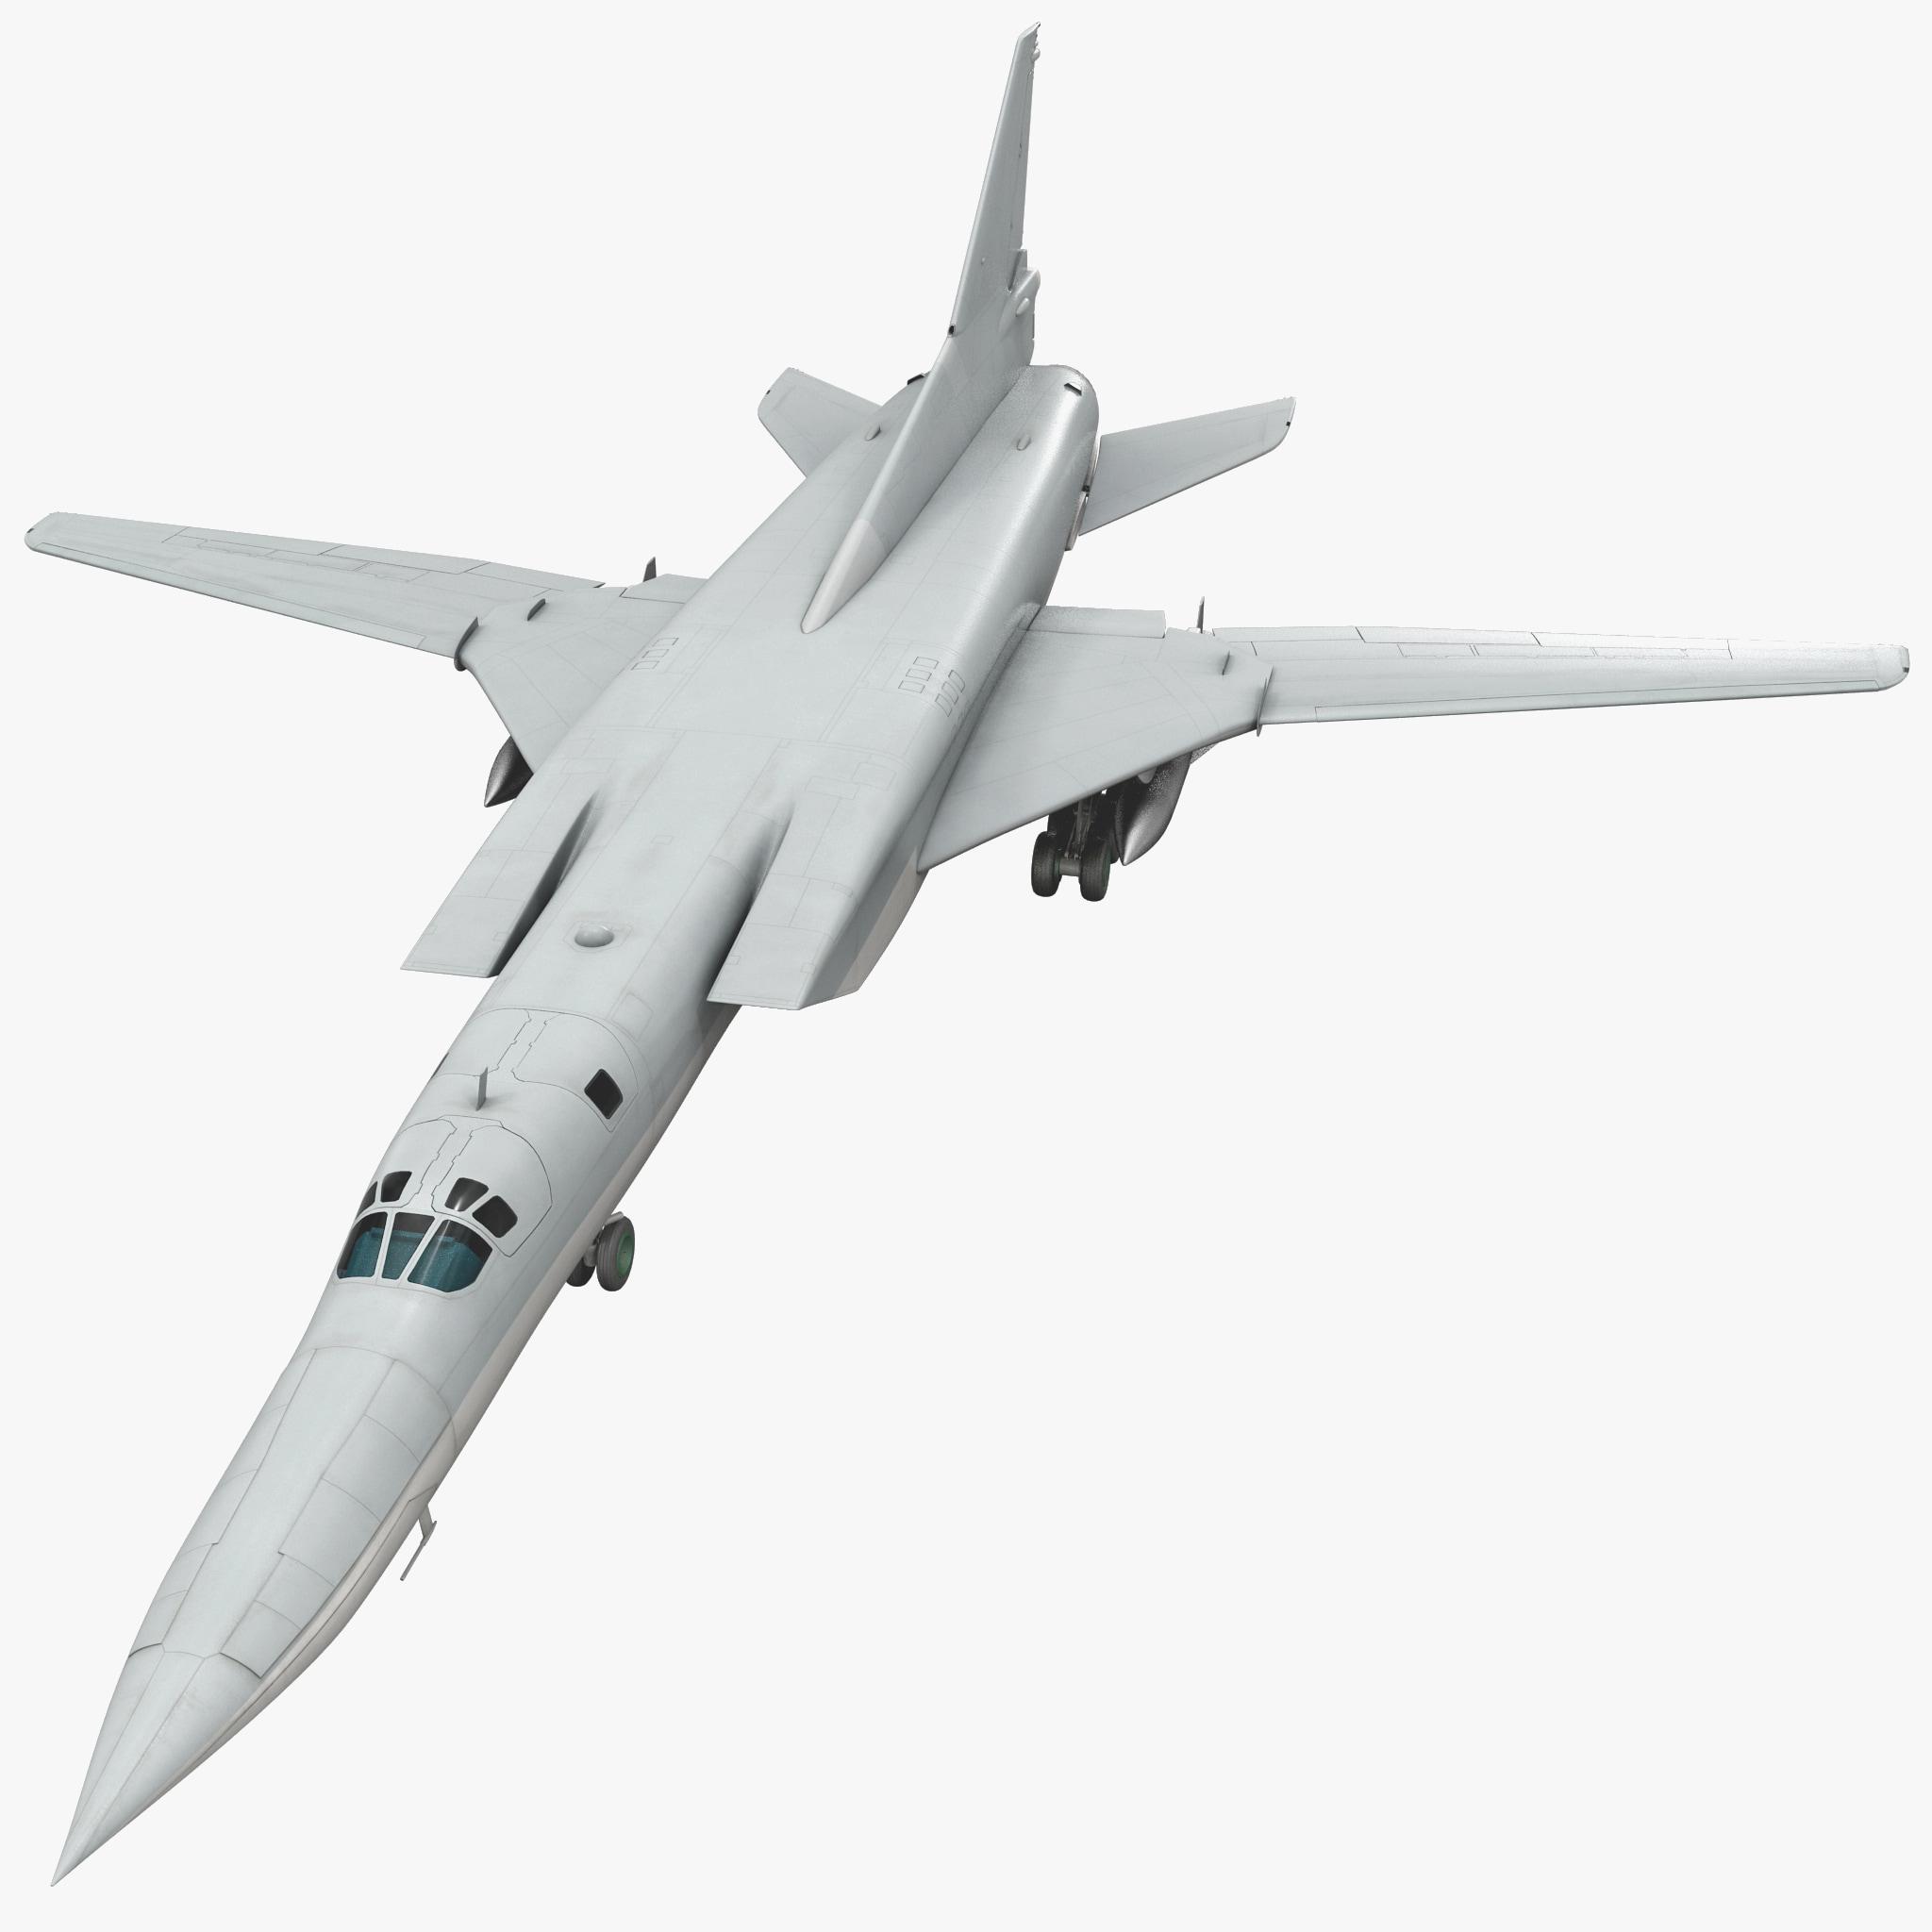 Russian strategic